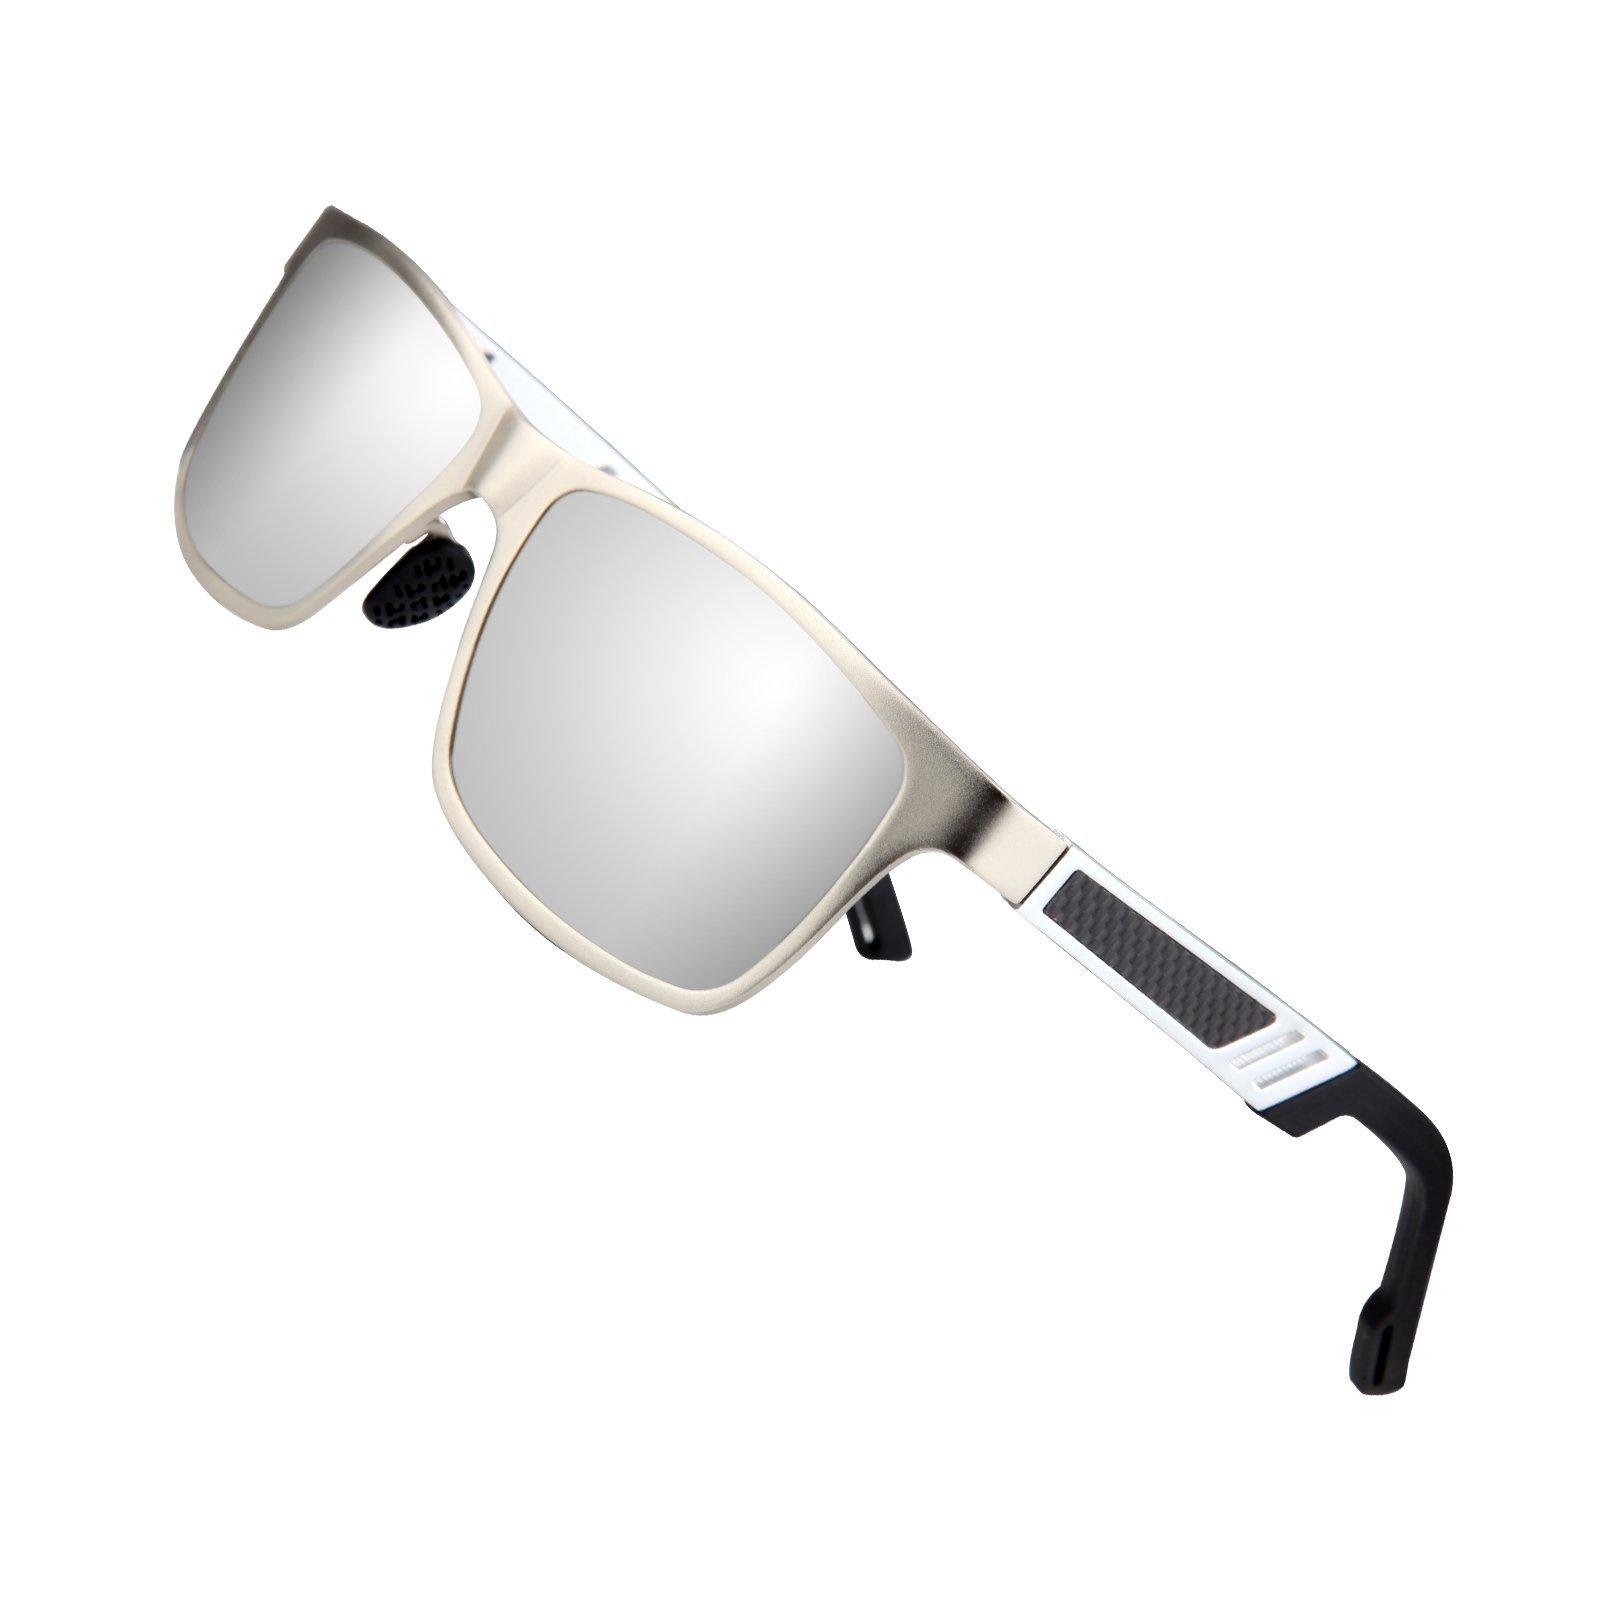 Sports Polarized Sunglasses for Men Driving Fishing Running Wayfarer Vintage Al-Mg Metal Frame Sun Glasses Silver